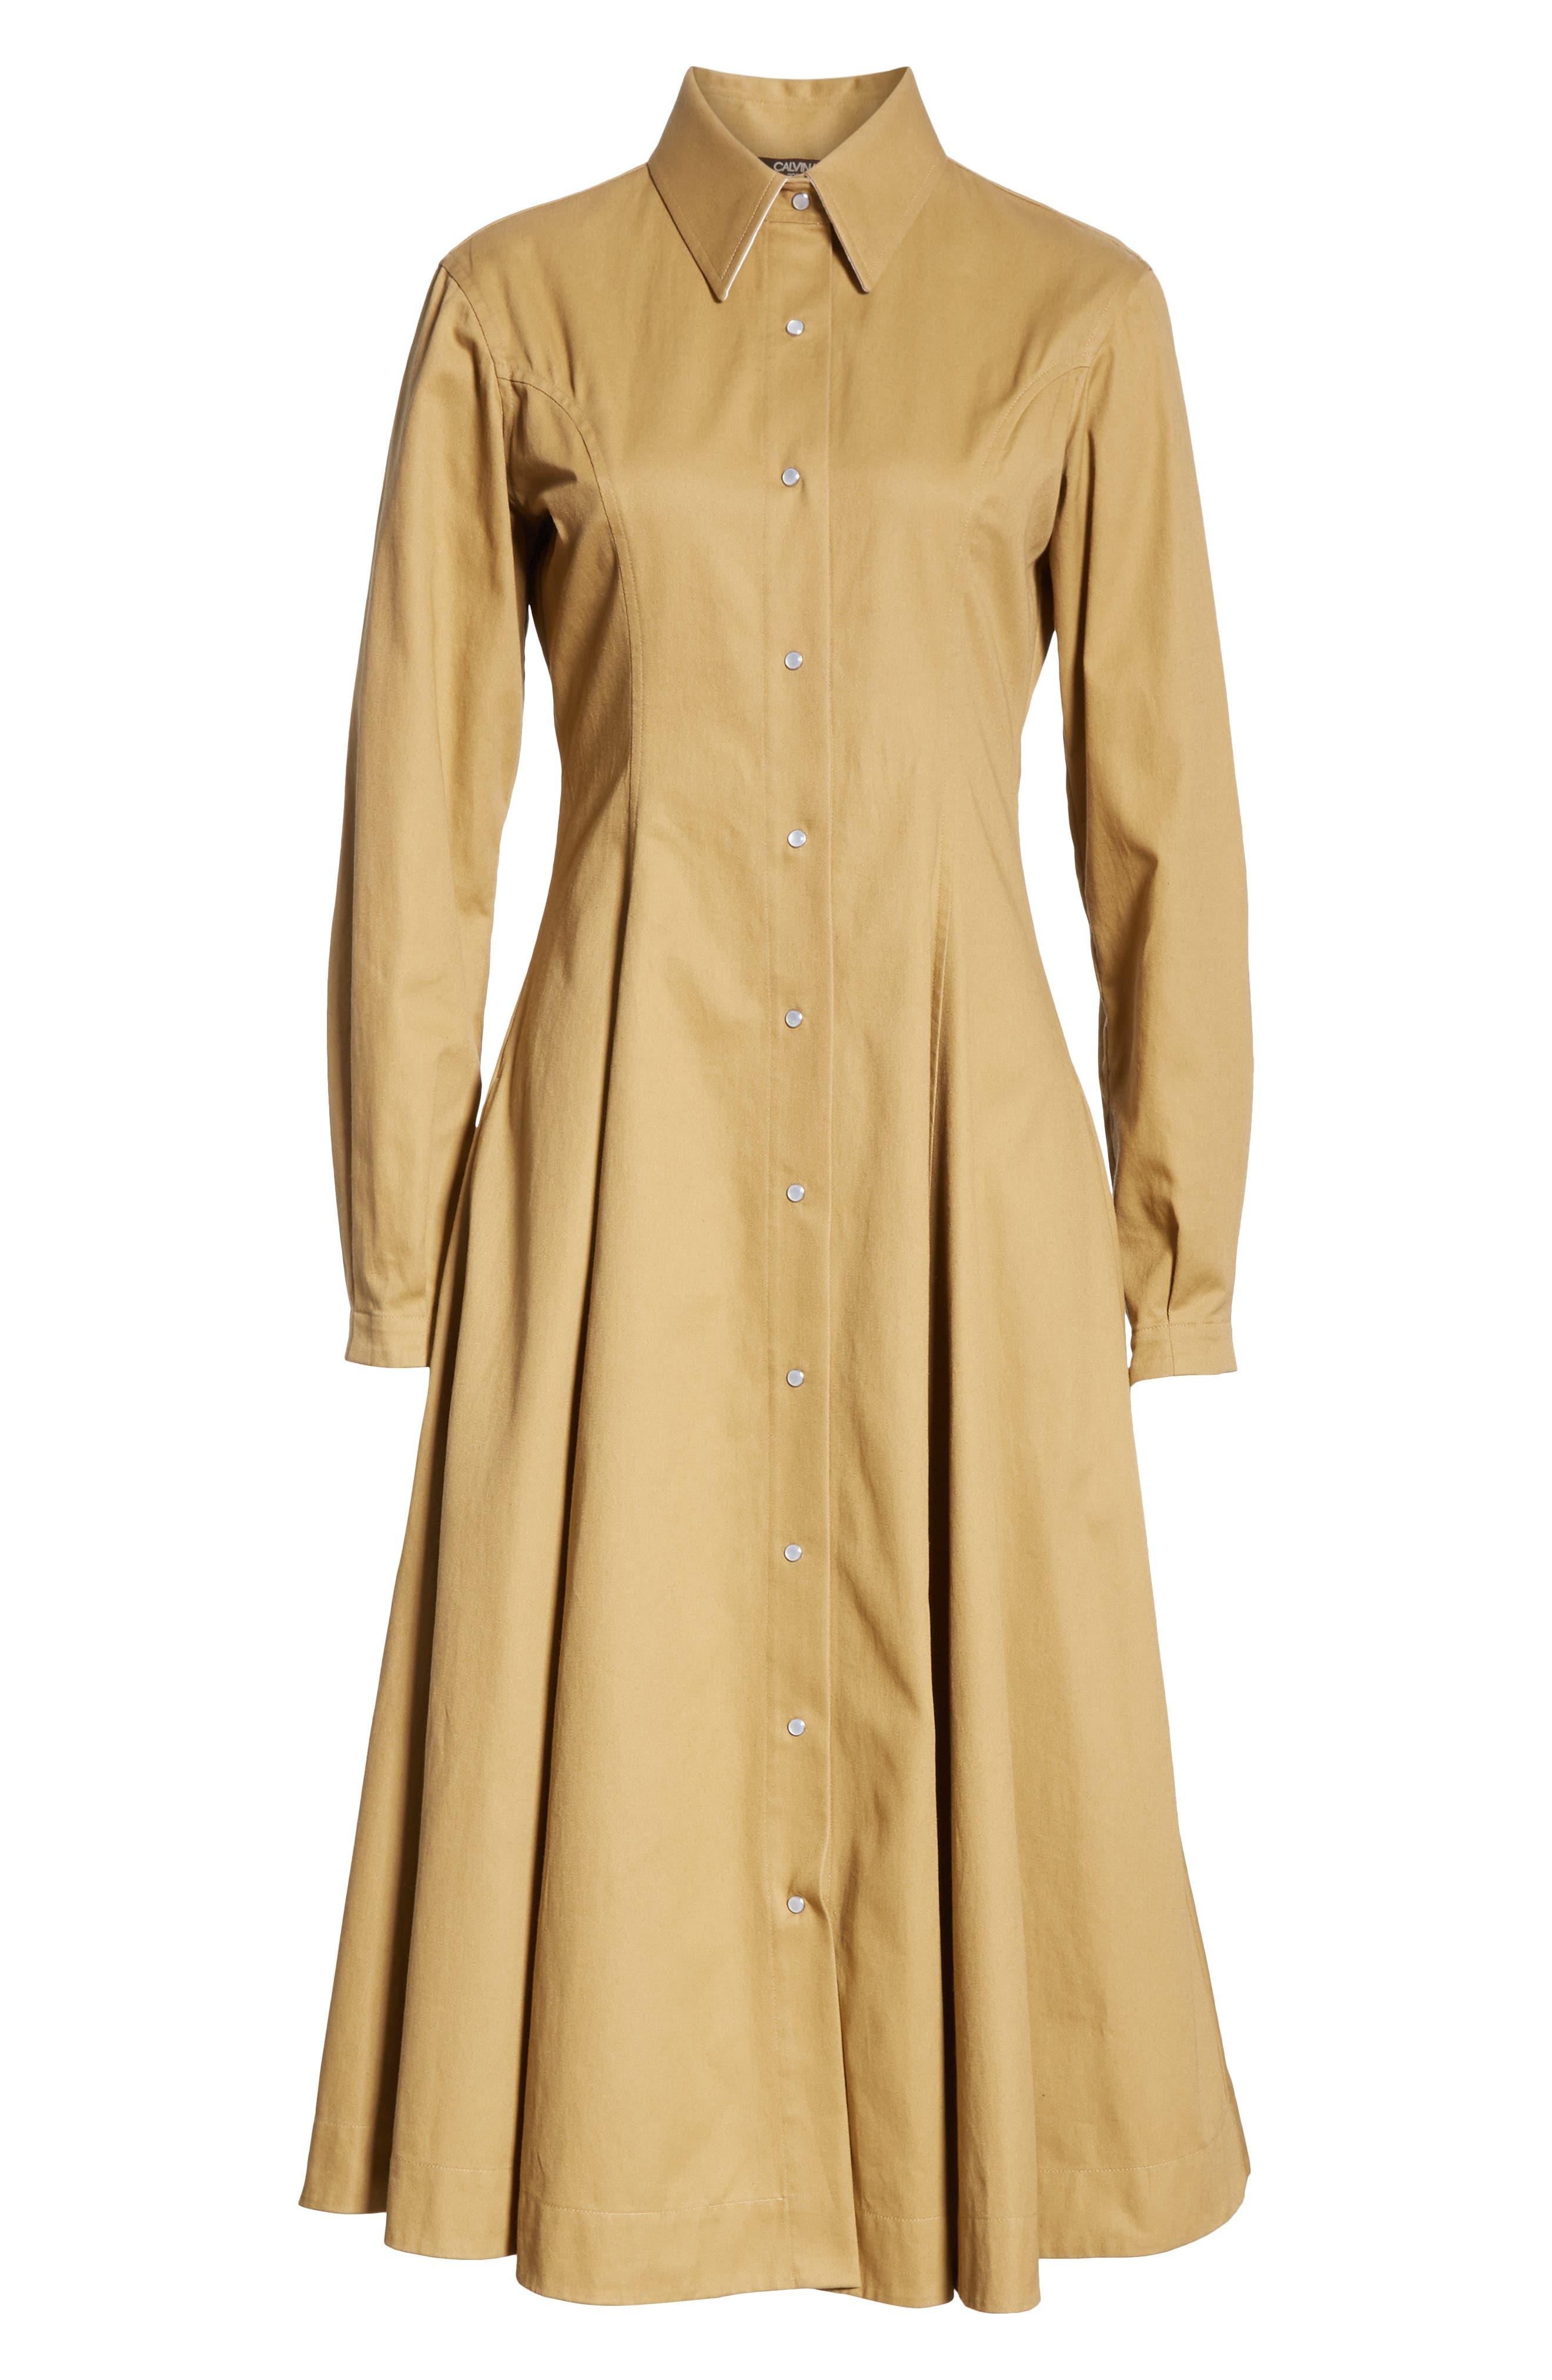 CALVIN KLEIN 205W39NYC, Western Twill A-Line Midi Dress, Alternate thumbnail 7, color, DUNE